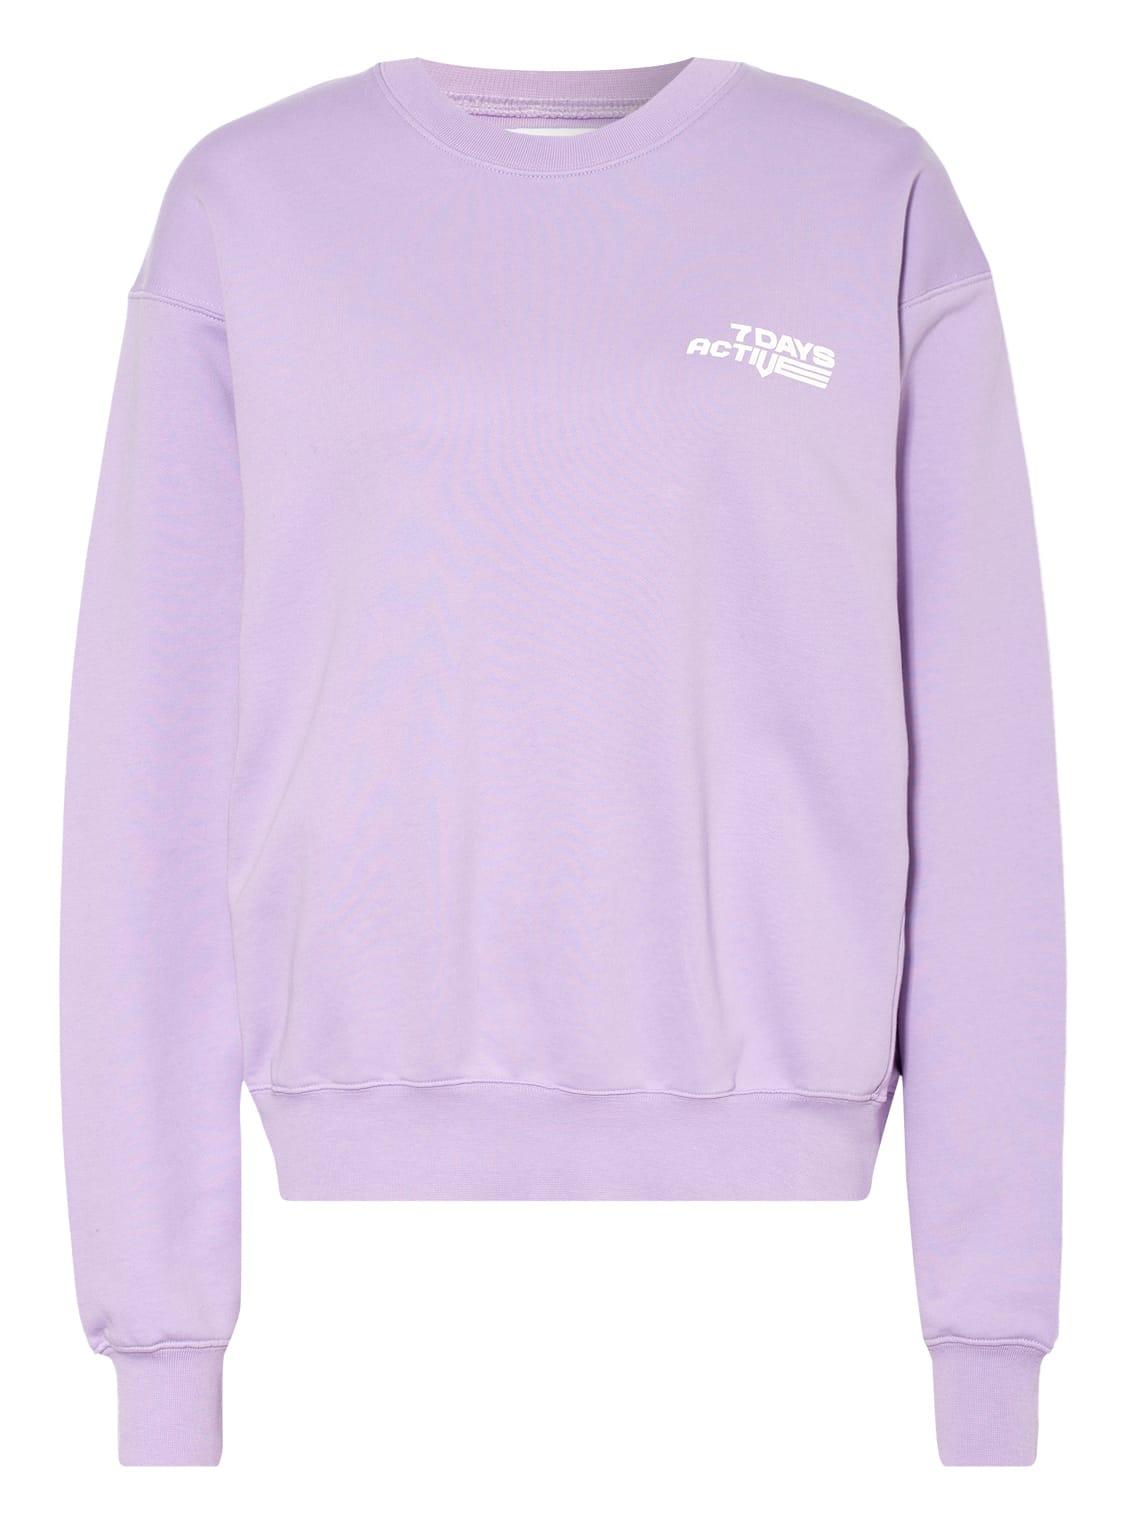 Image of 7 Days Active Sweatshirt Monday violett